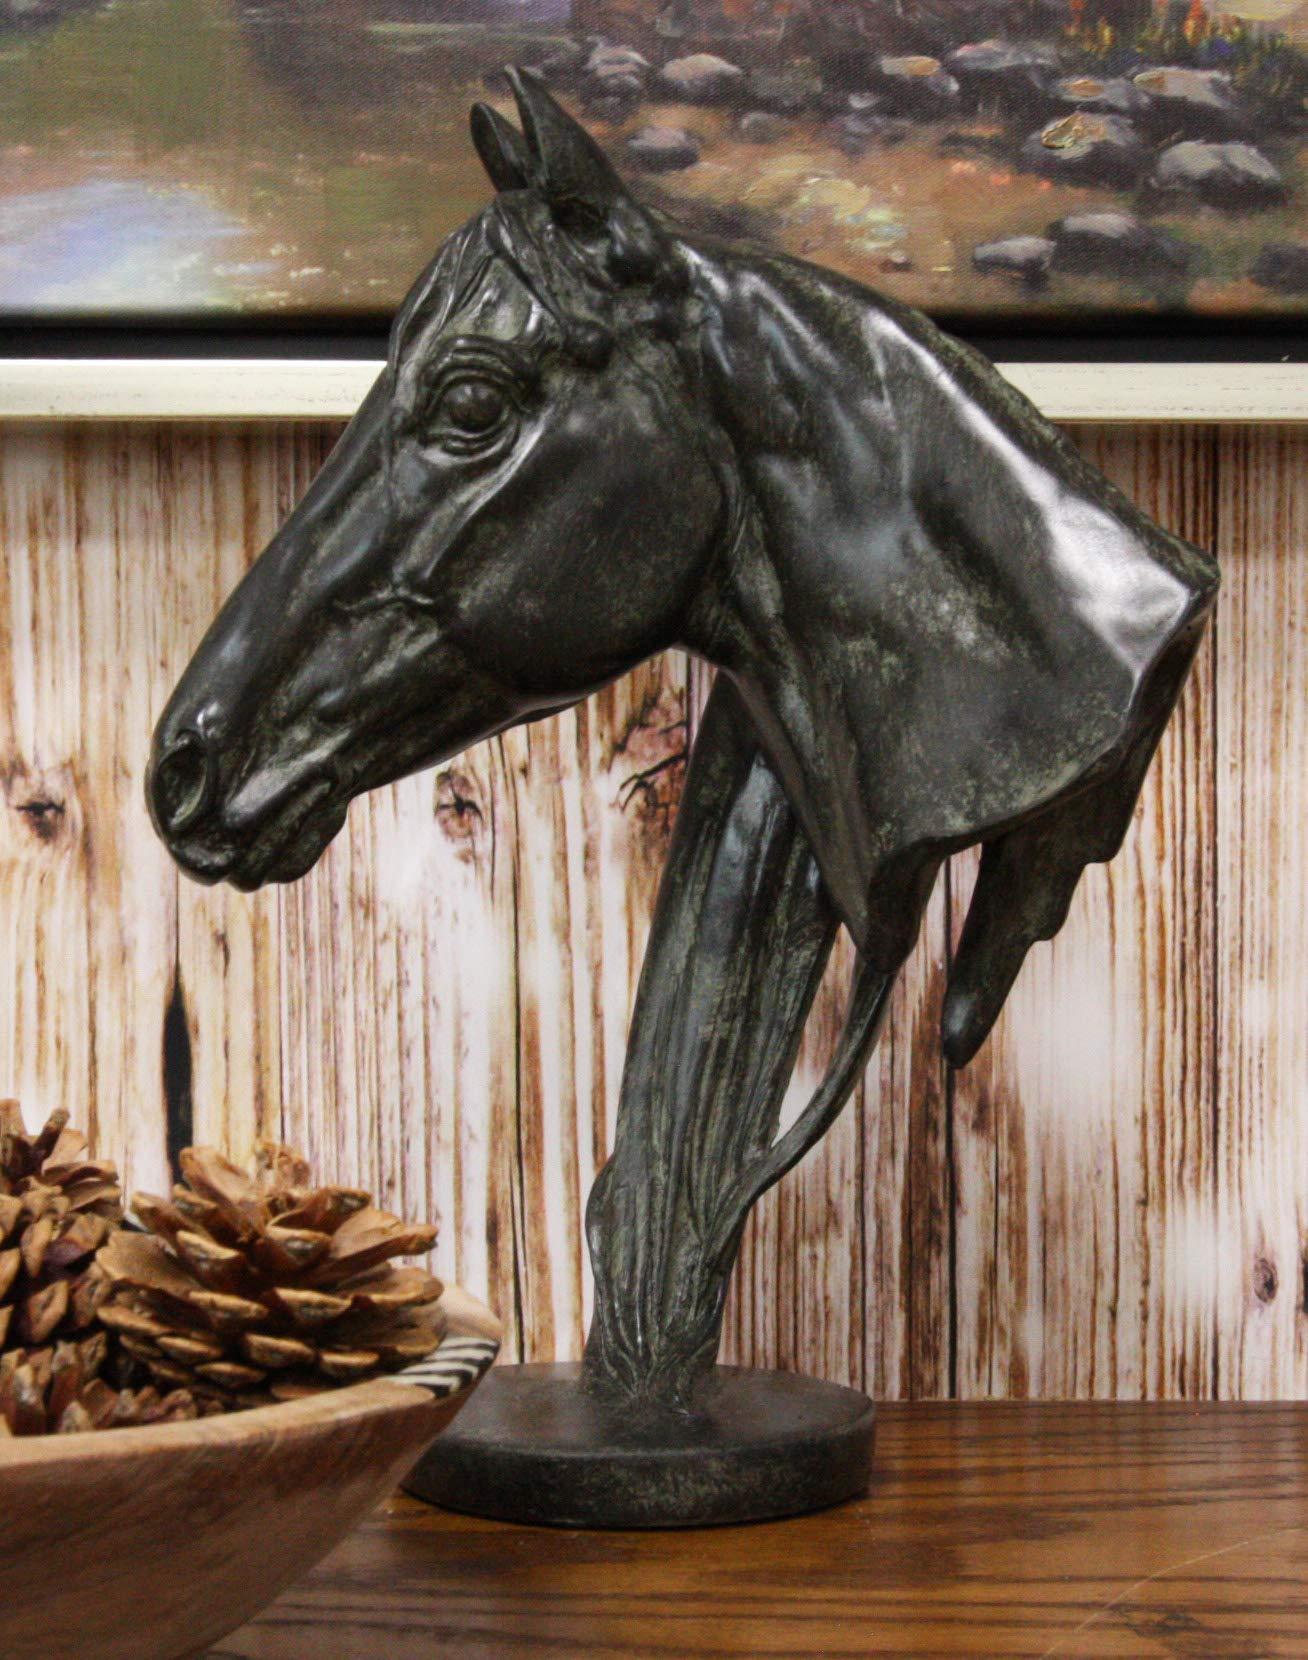 Ebros Terracotta Horse Bust Sculpture 12 25 Tall Faux Granite Resin Decor Stallion Horse Head Statue Buy Online In Moldova At Moldova Desertcart Com Productid 107322119